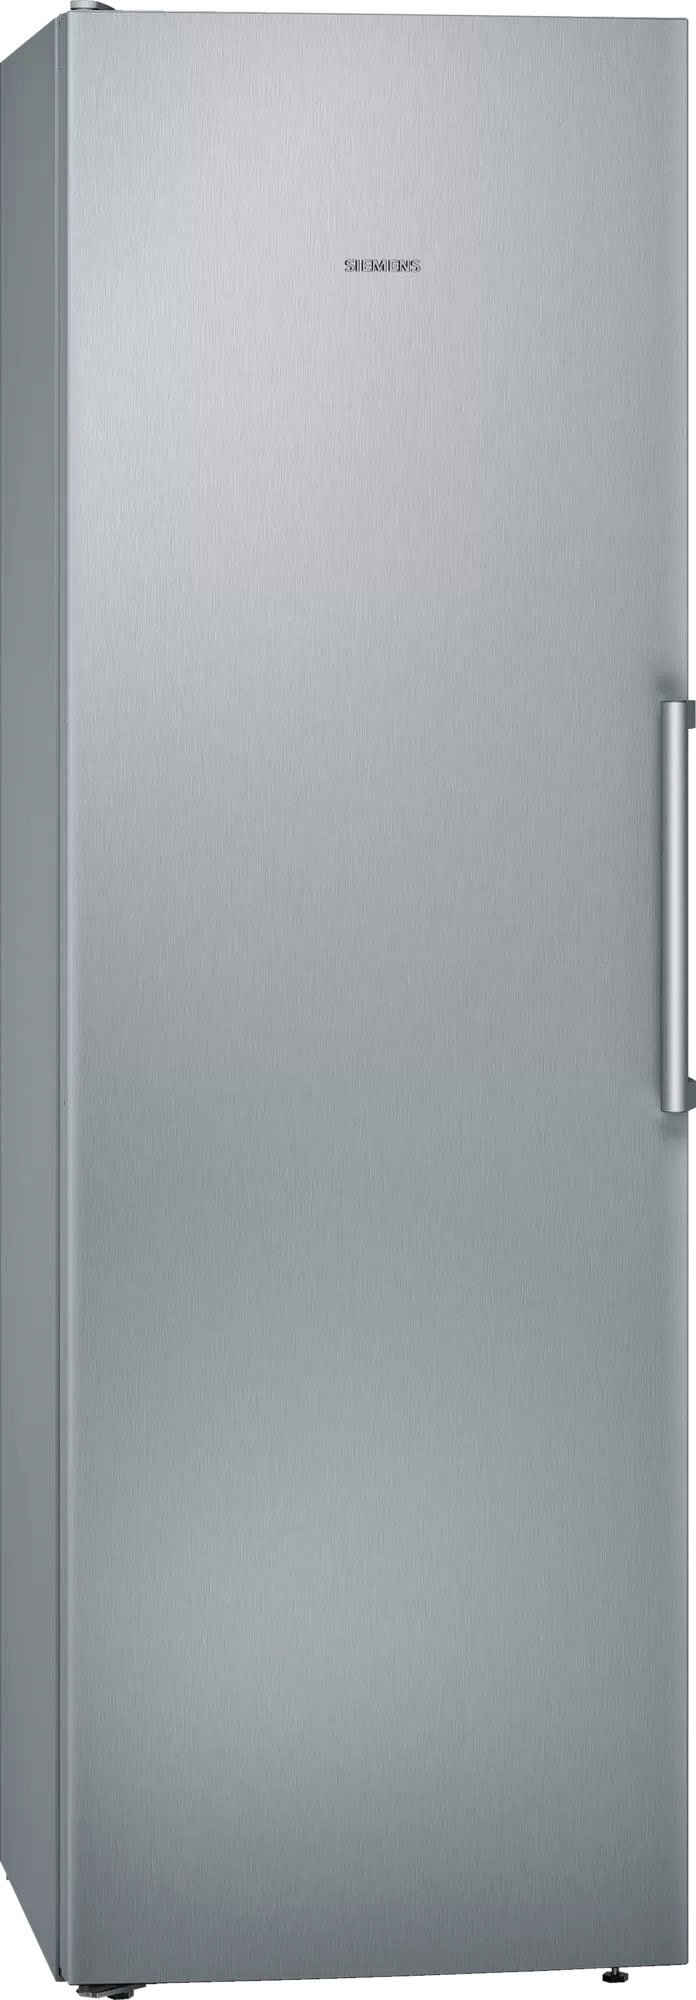 SIEMENS Kühlschrank iQ300 KS36VVIEP, 186 cm hoch, 60 cm breit